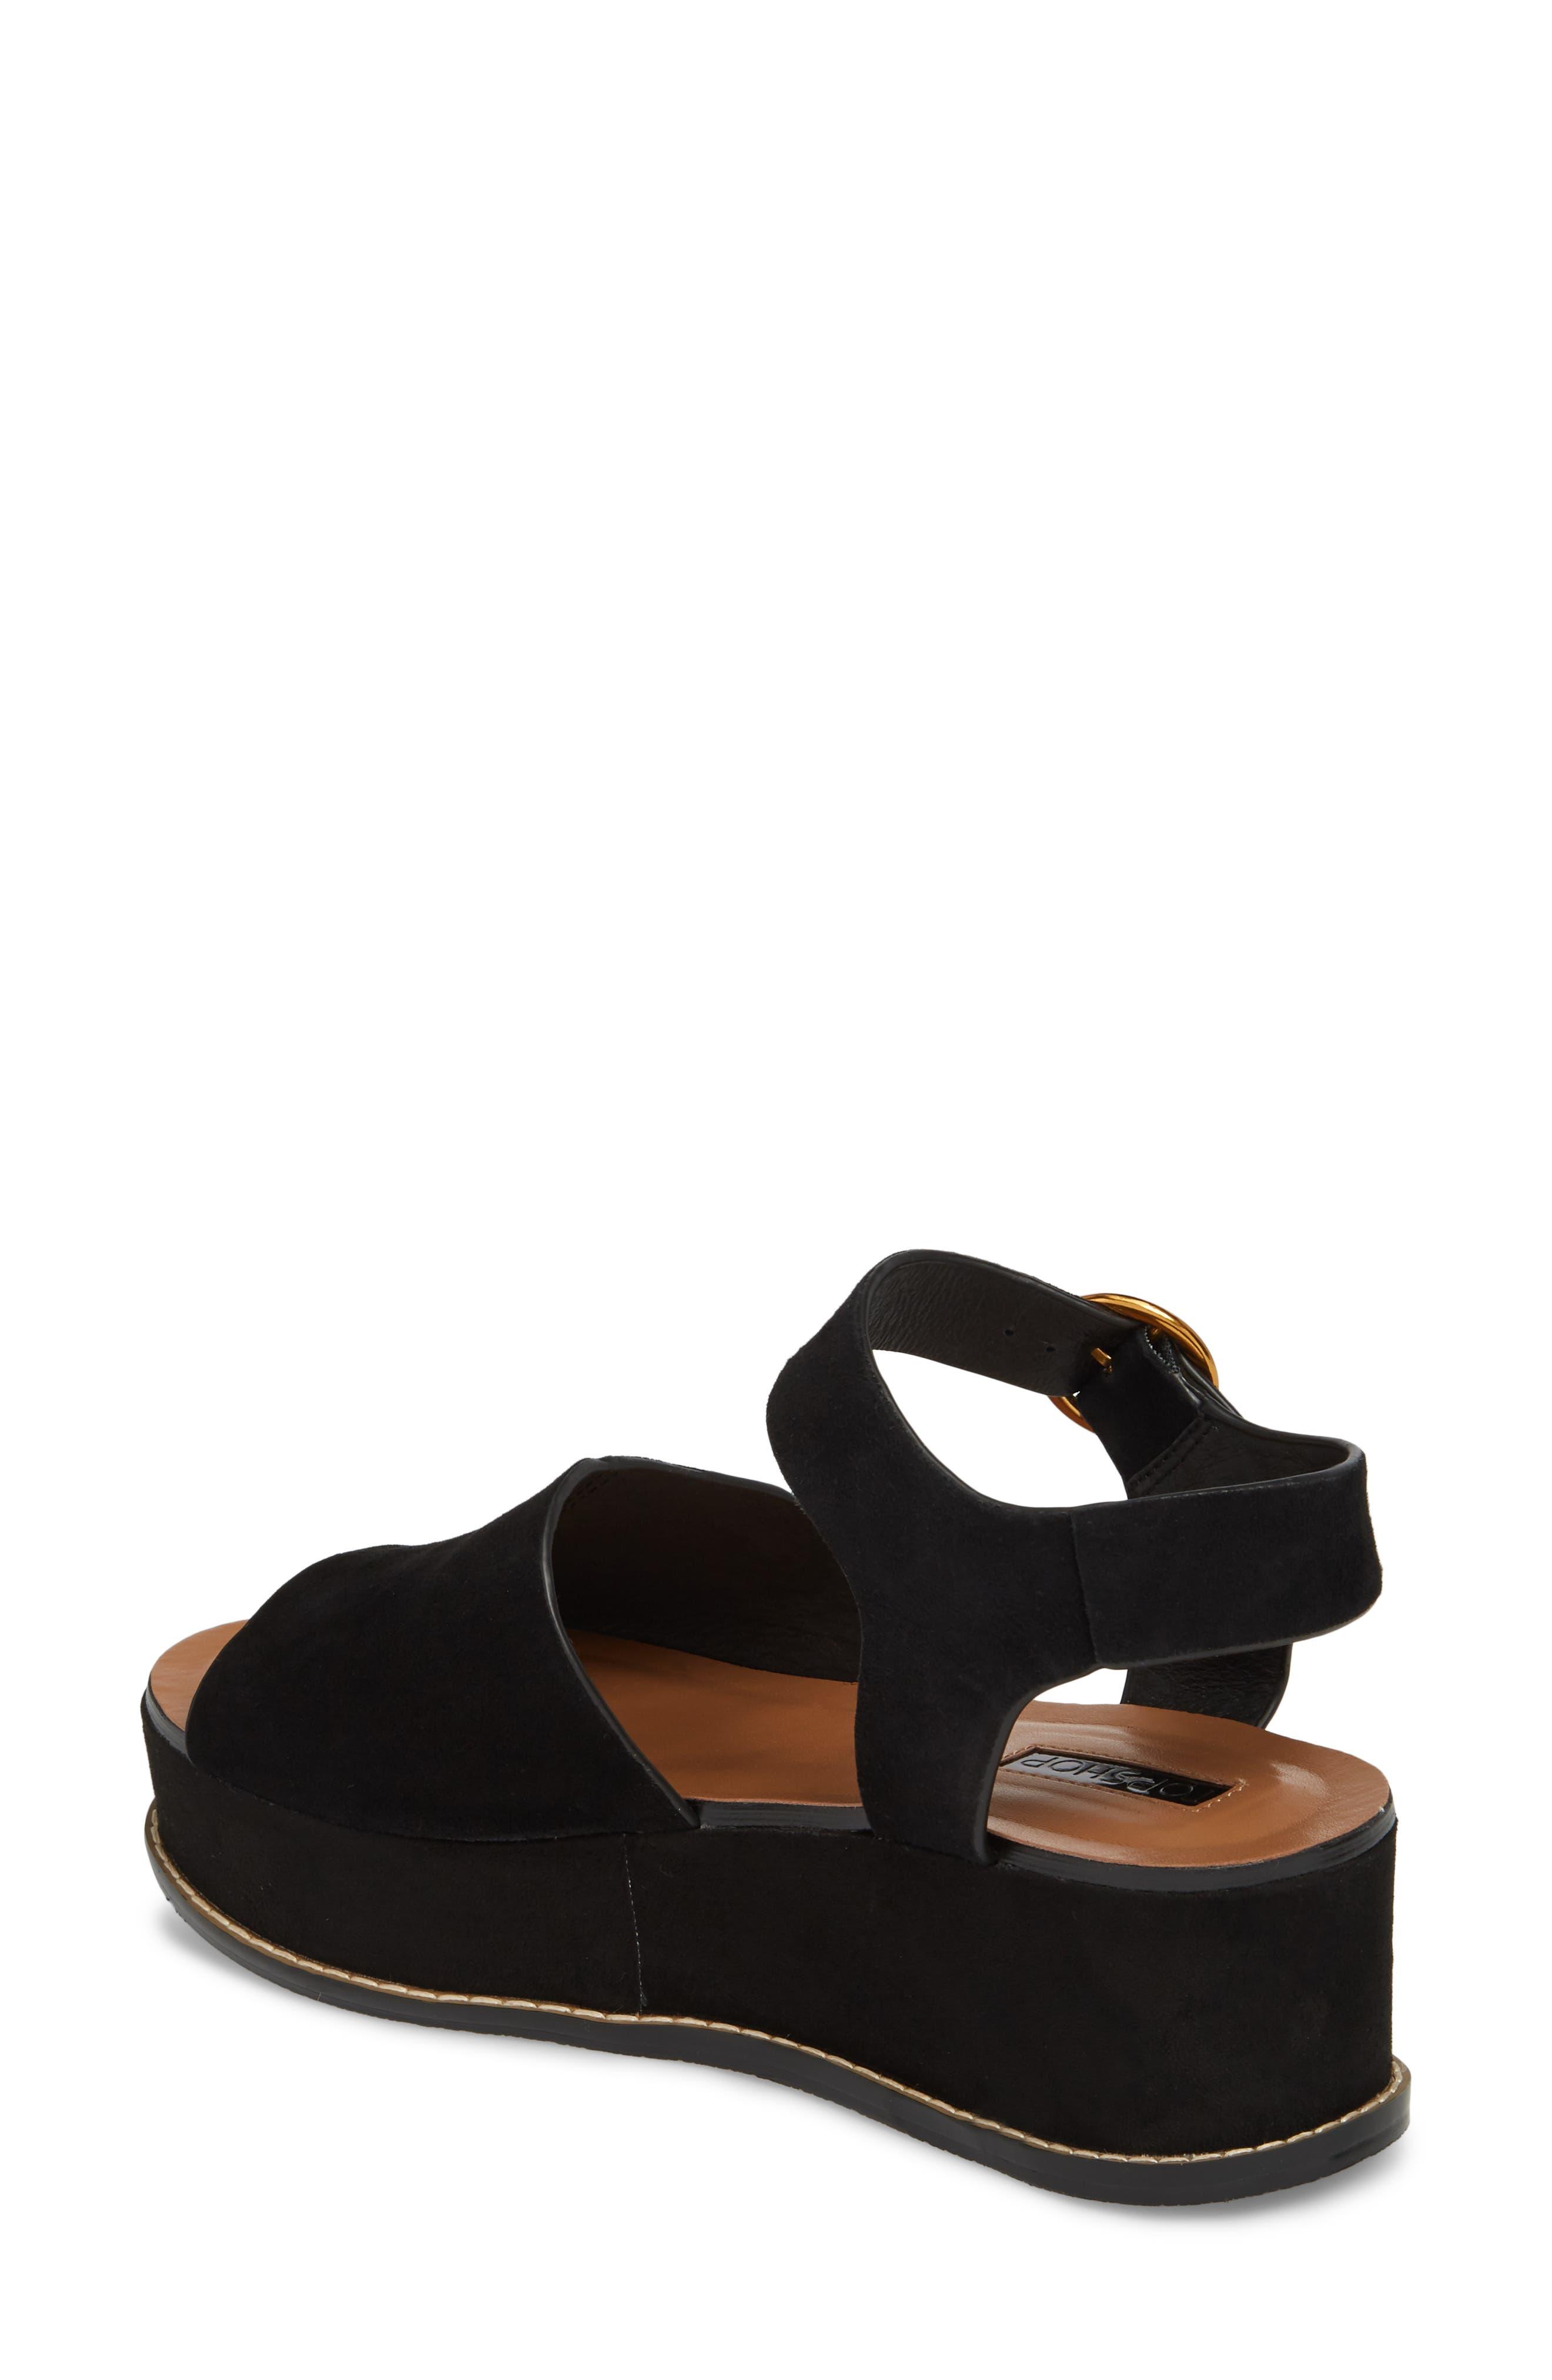 Wow Platform Wedge Sandal,                             Alternate thumbnail 2, color,                             Black